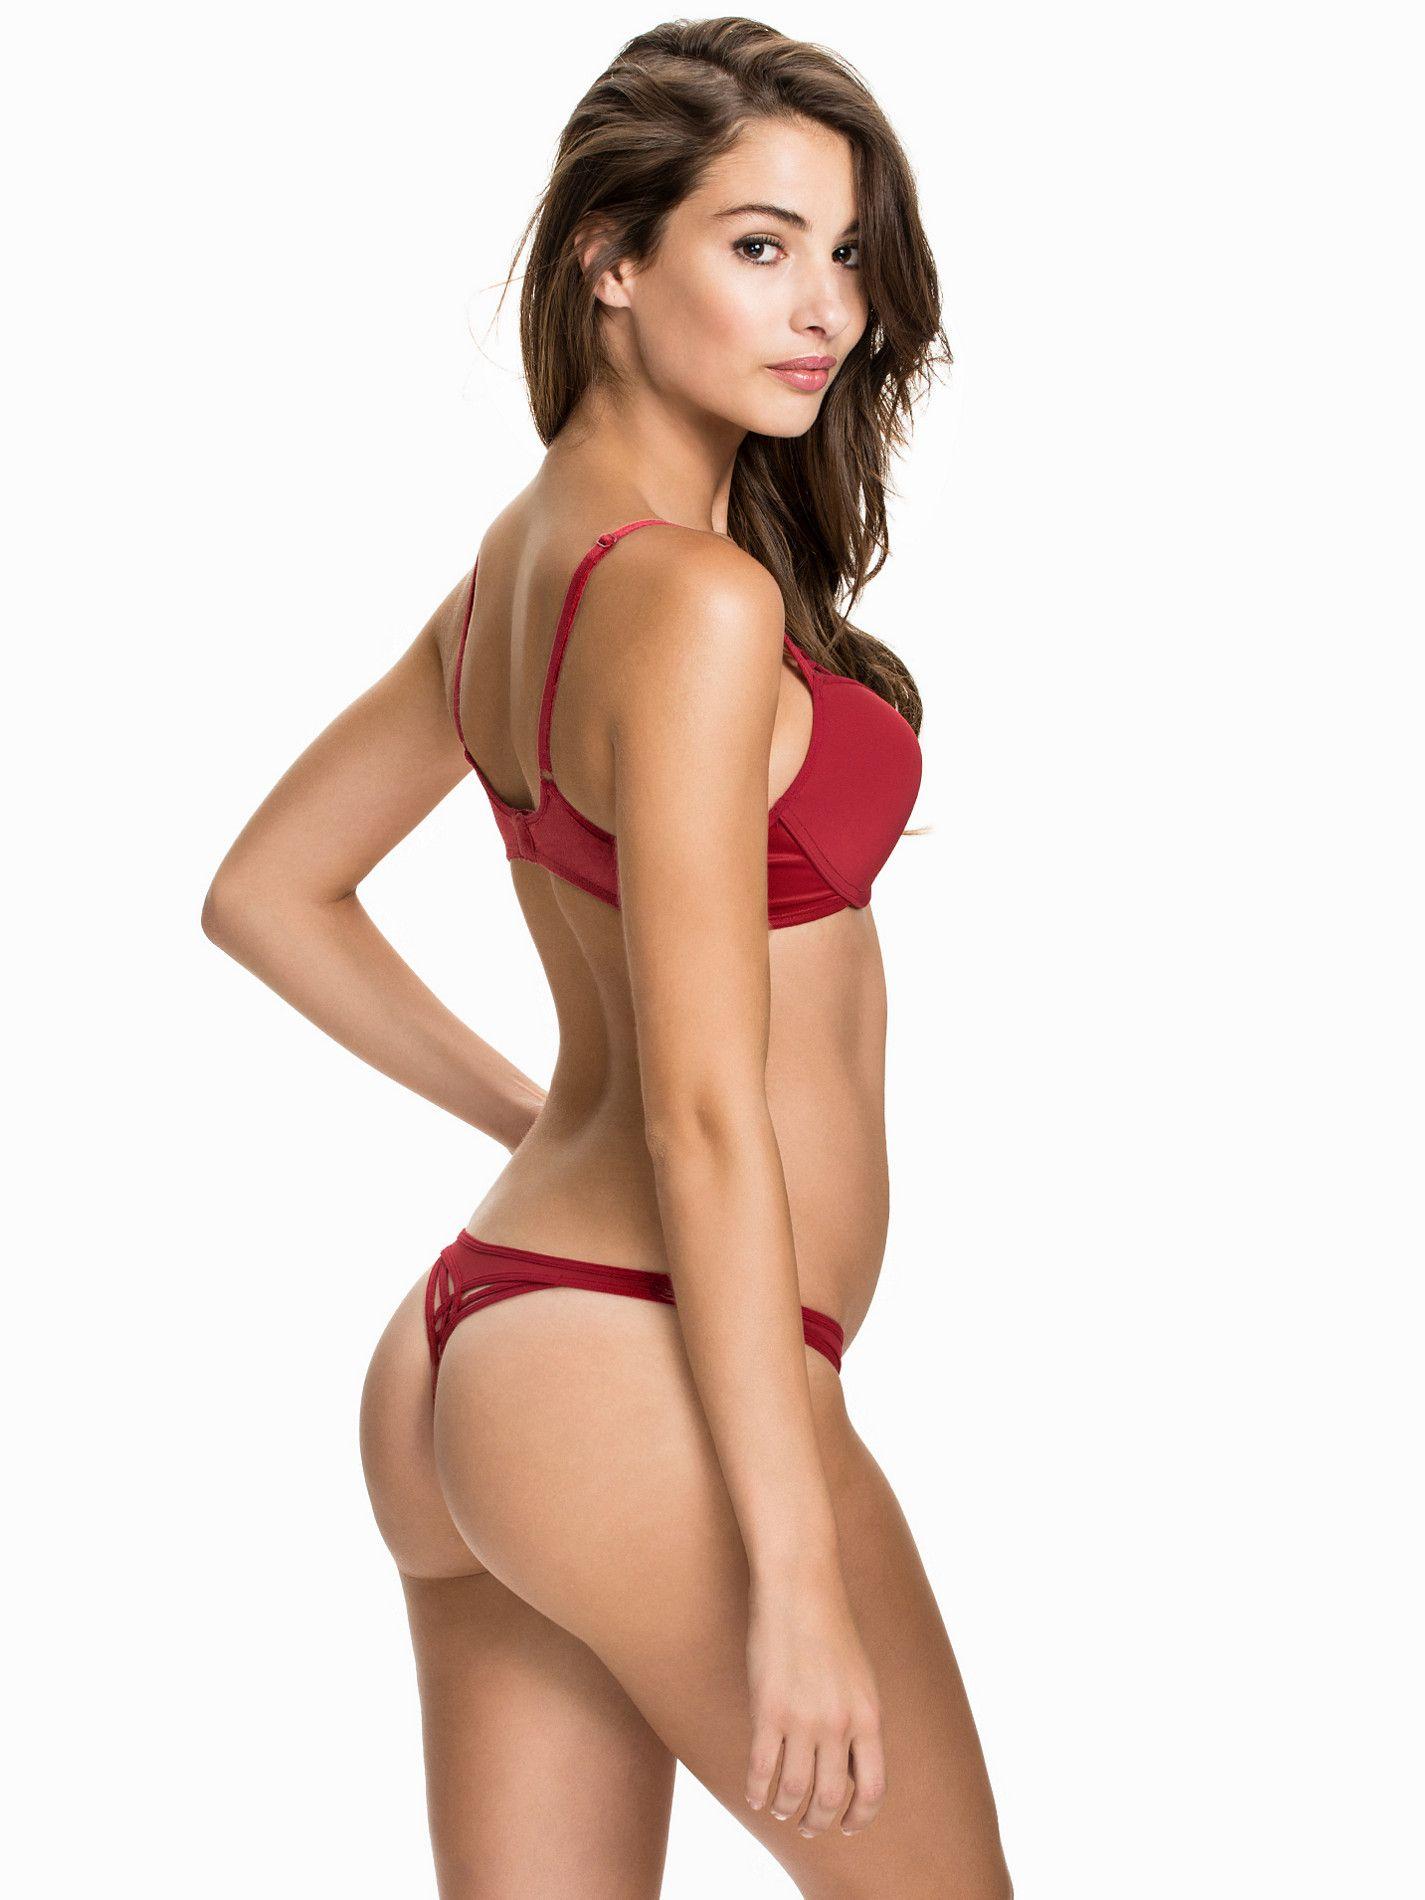 nude Hot Katherine Henderson (17 fotos) Topless, Facebook, butt